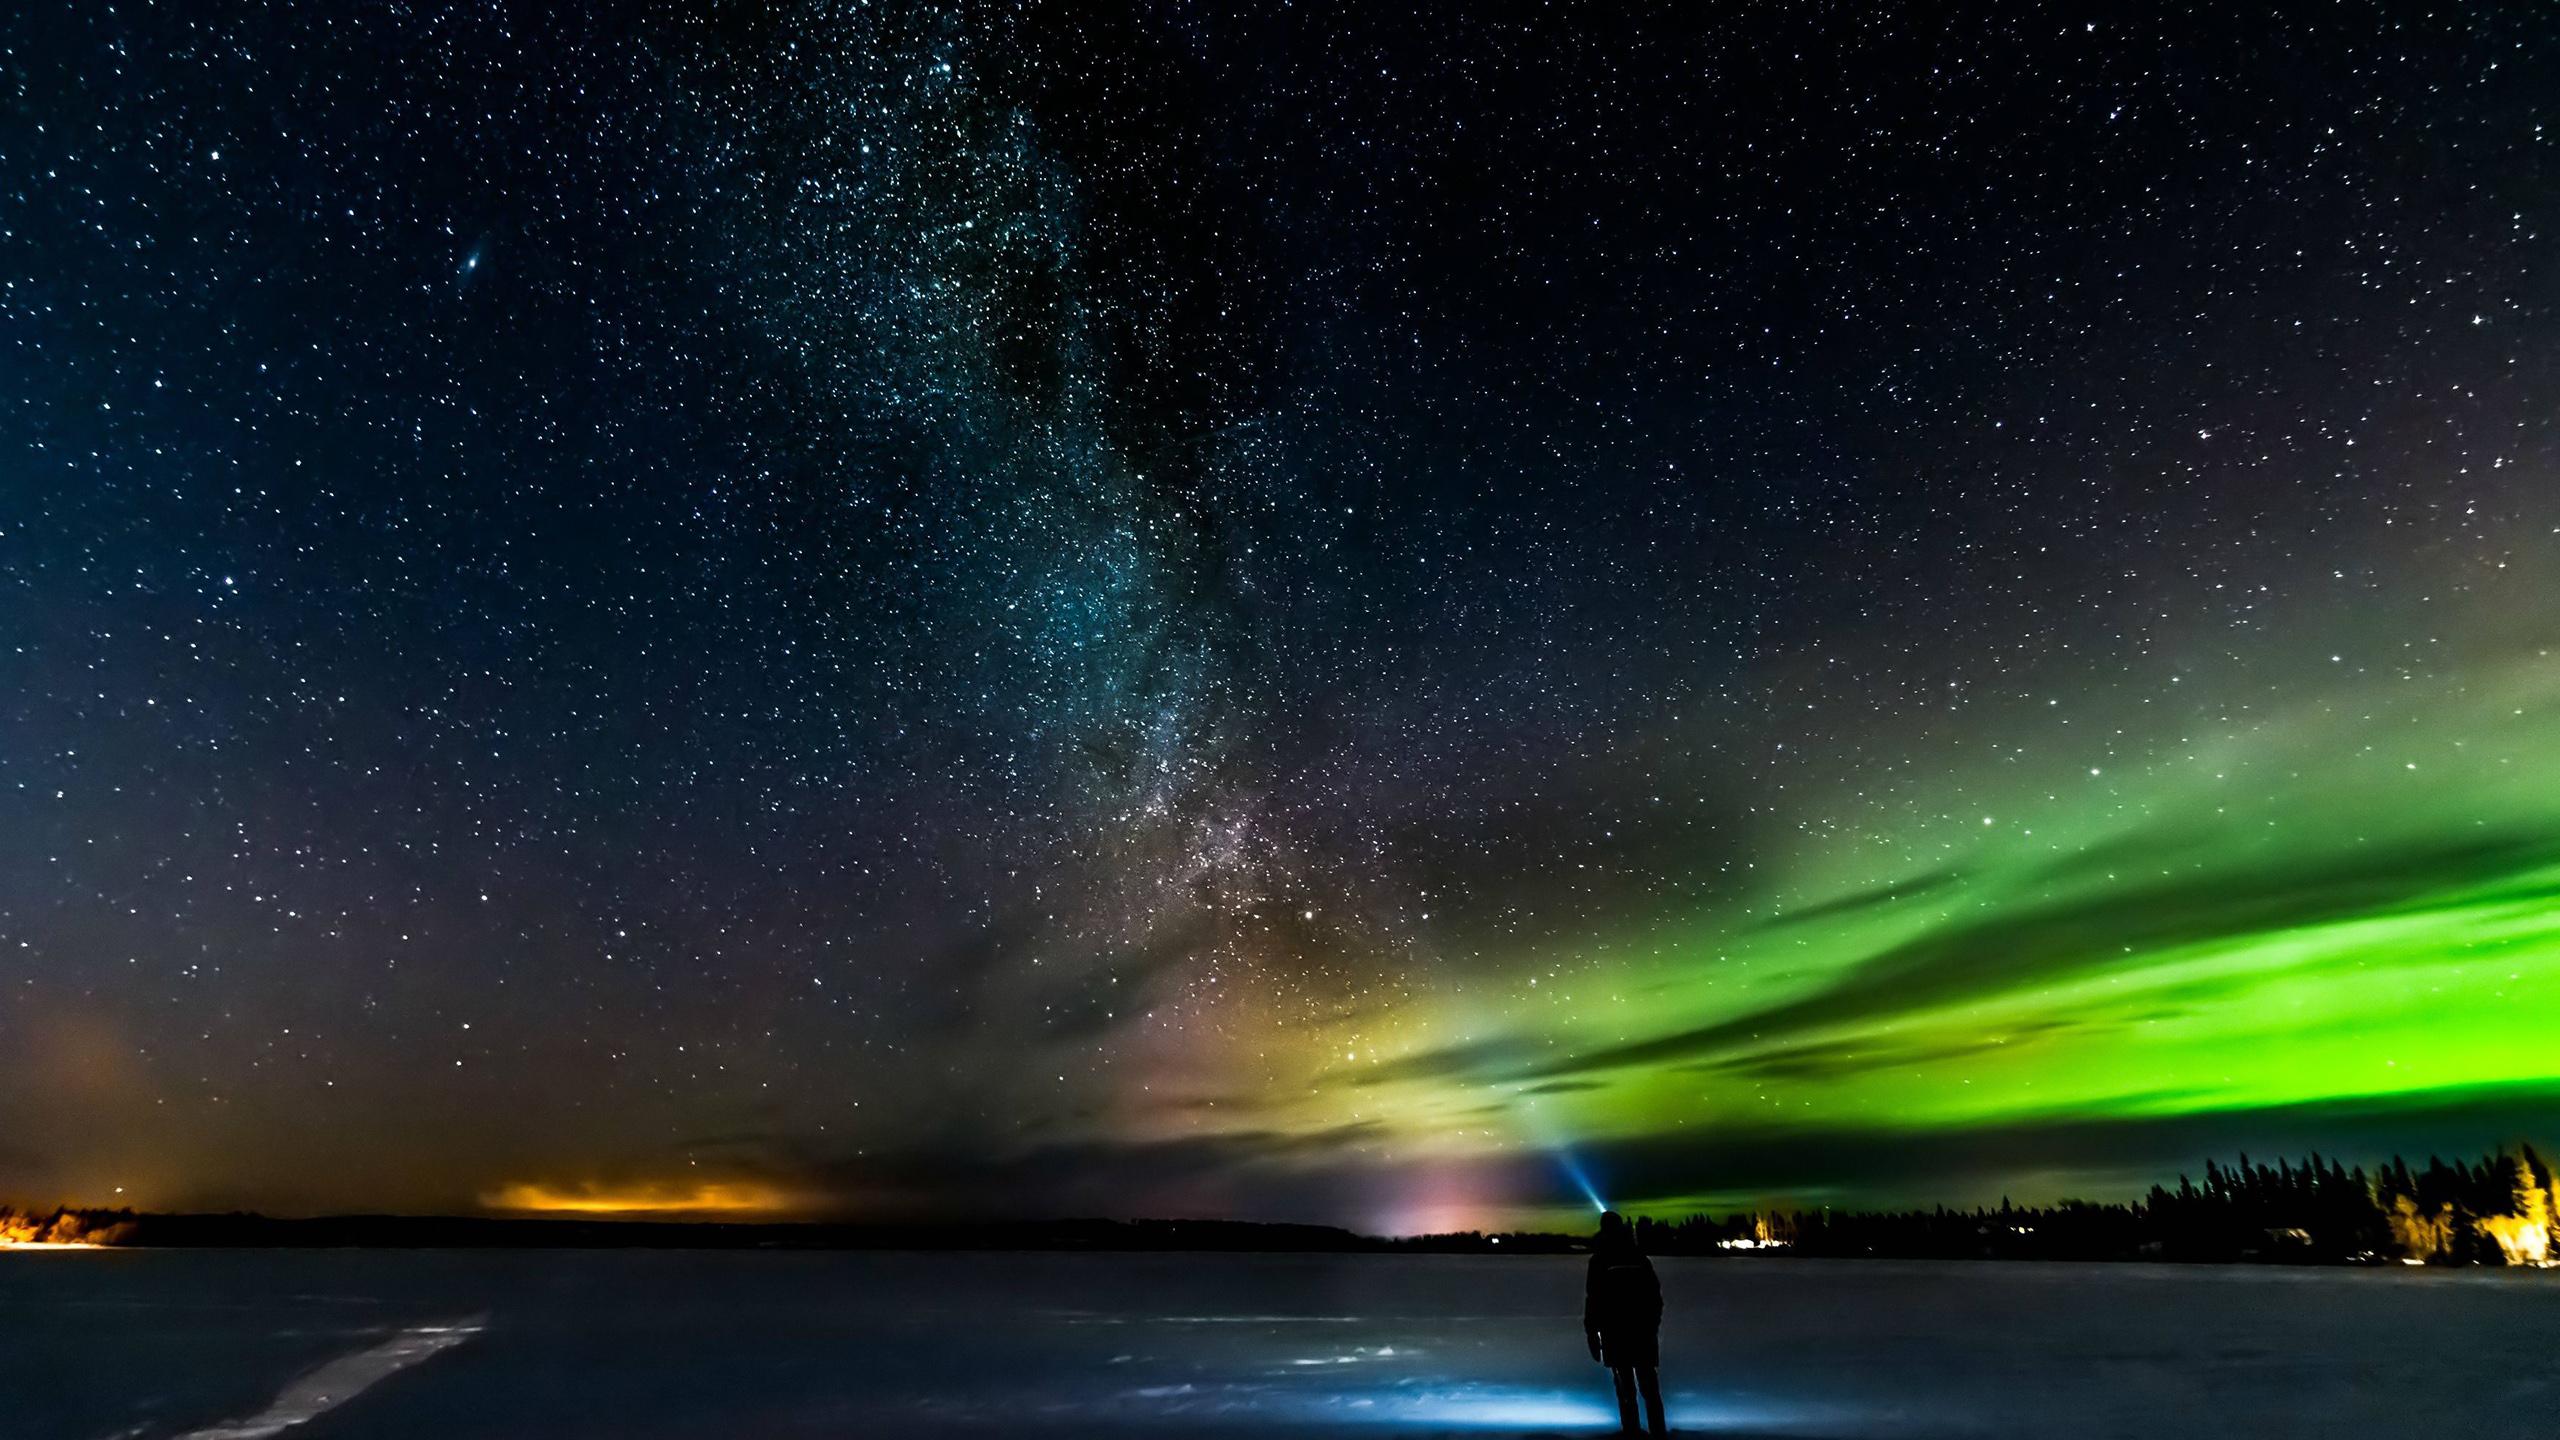 26+ Northern Lights 4K Wallpapers on WallpaperSafari